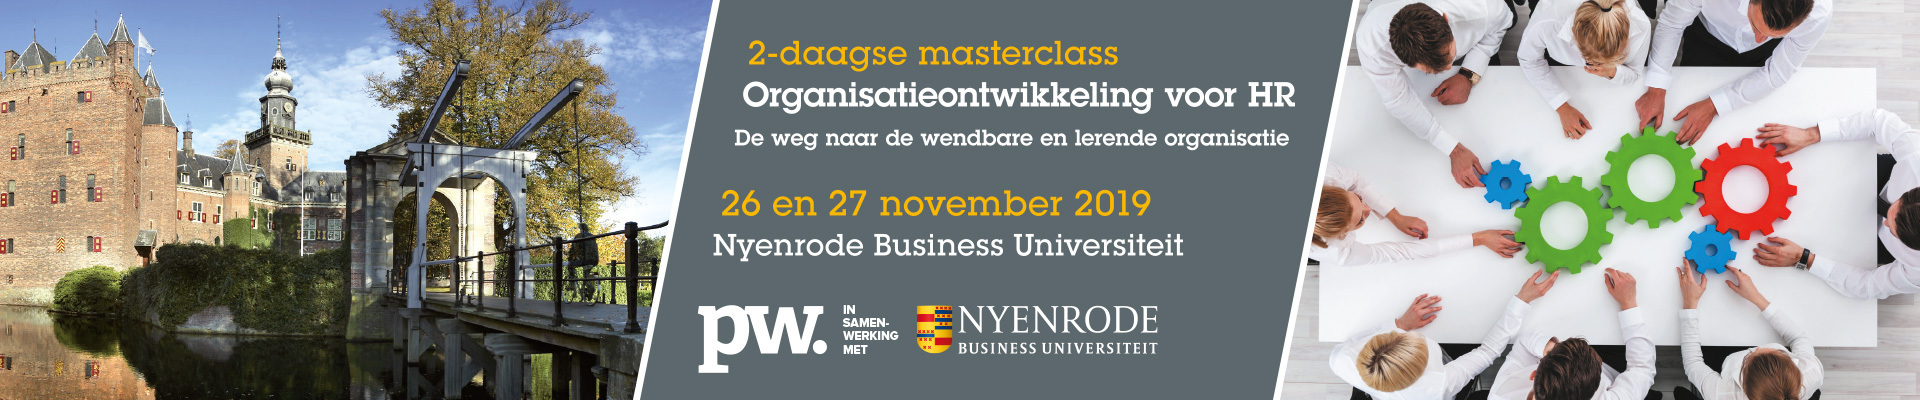 Nyenrode Masterclass Organisatieontwikkeling 2019